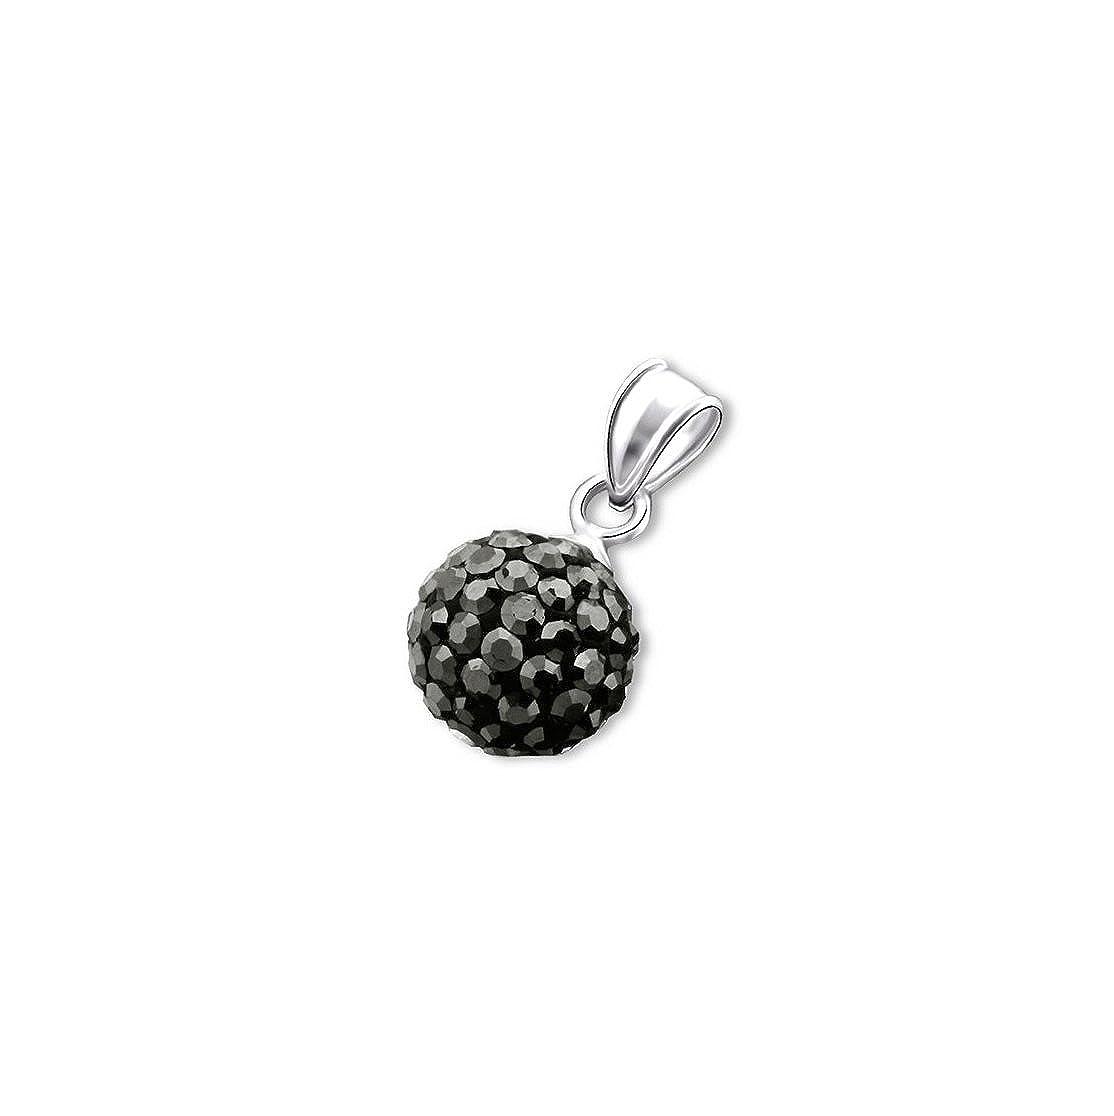 Liara Boule Cristal pendentif en Argent Sterling 925./Poli et sans Nickel